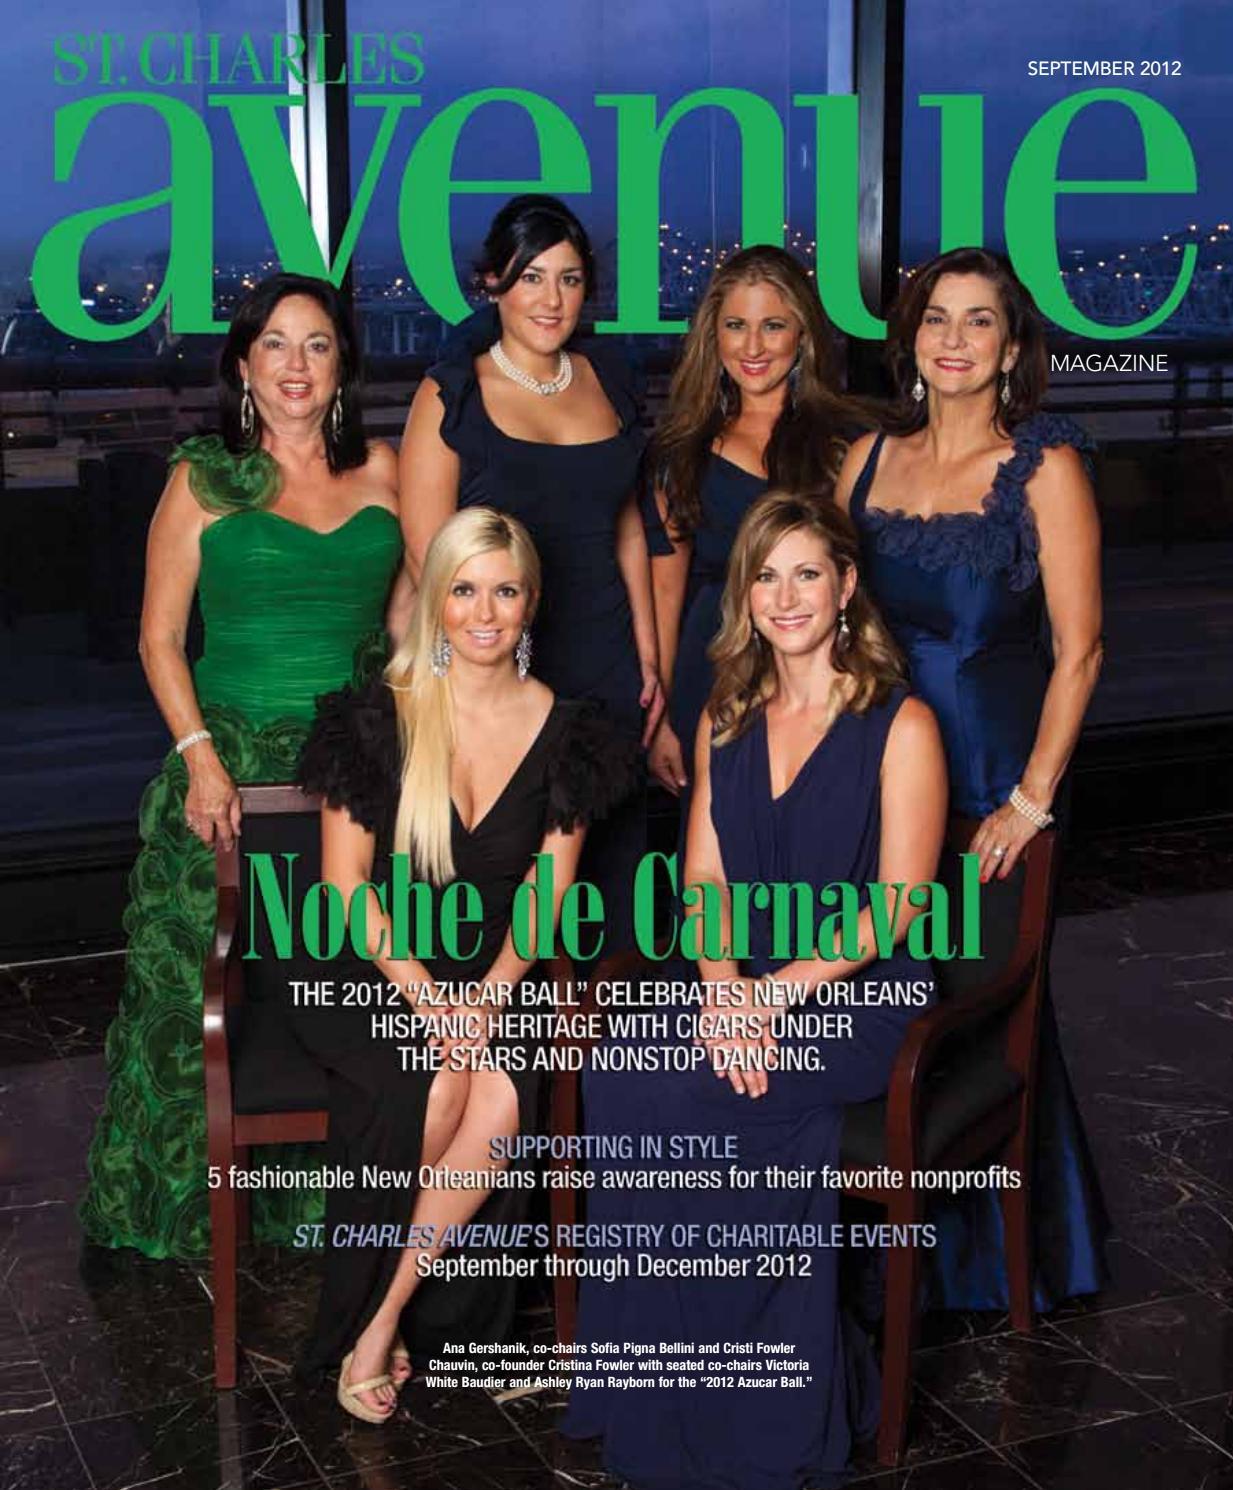 Angelique Lewis Nude st. charles avenue september 2012renaissance publishing